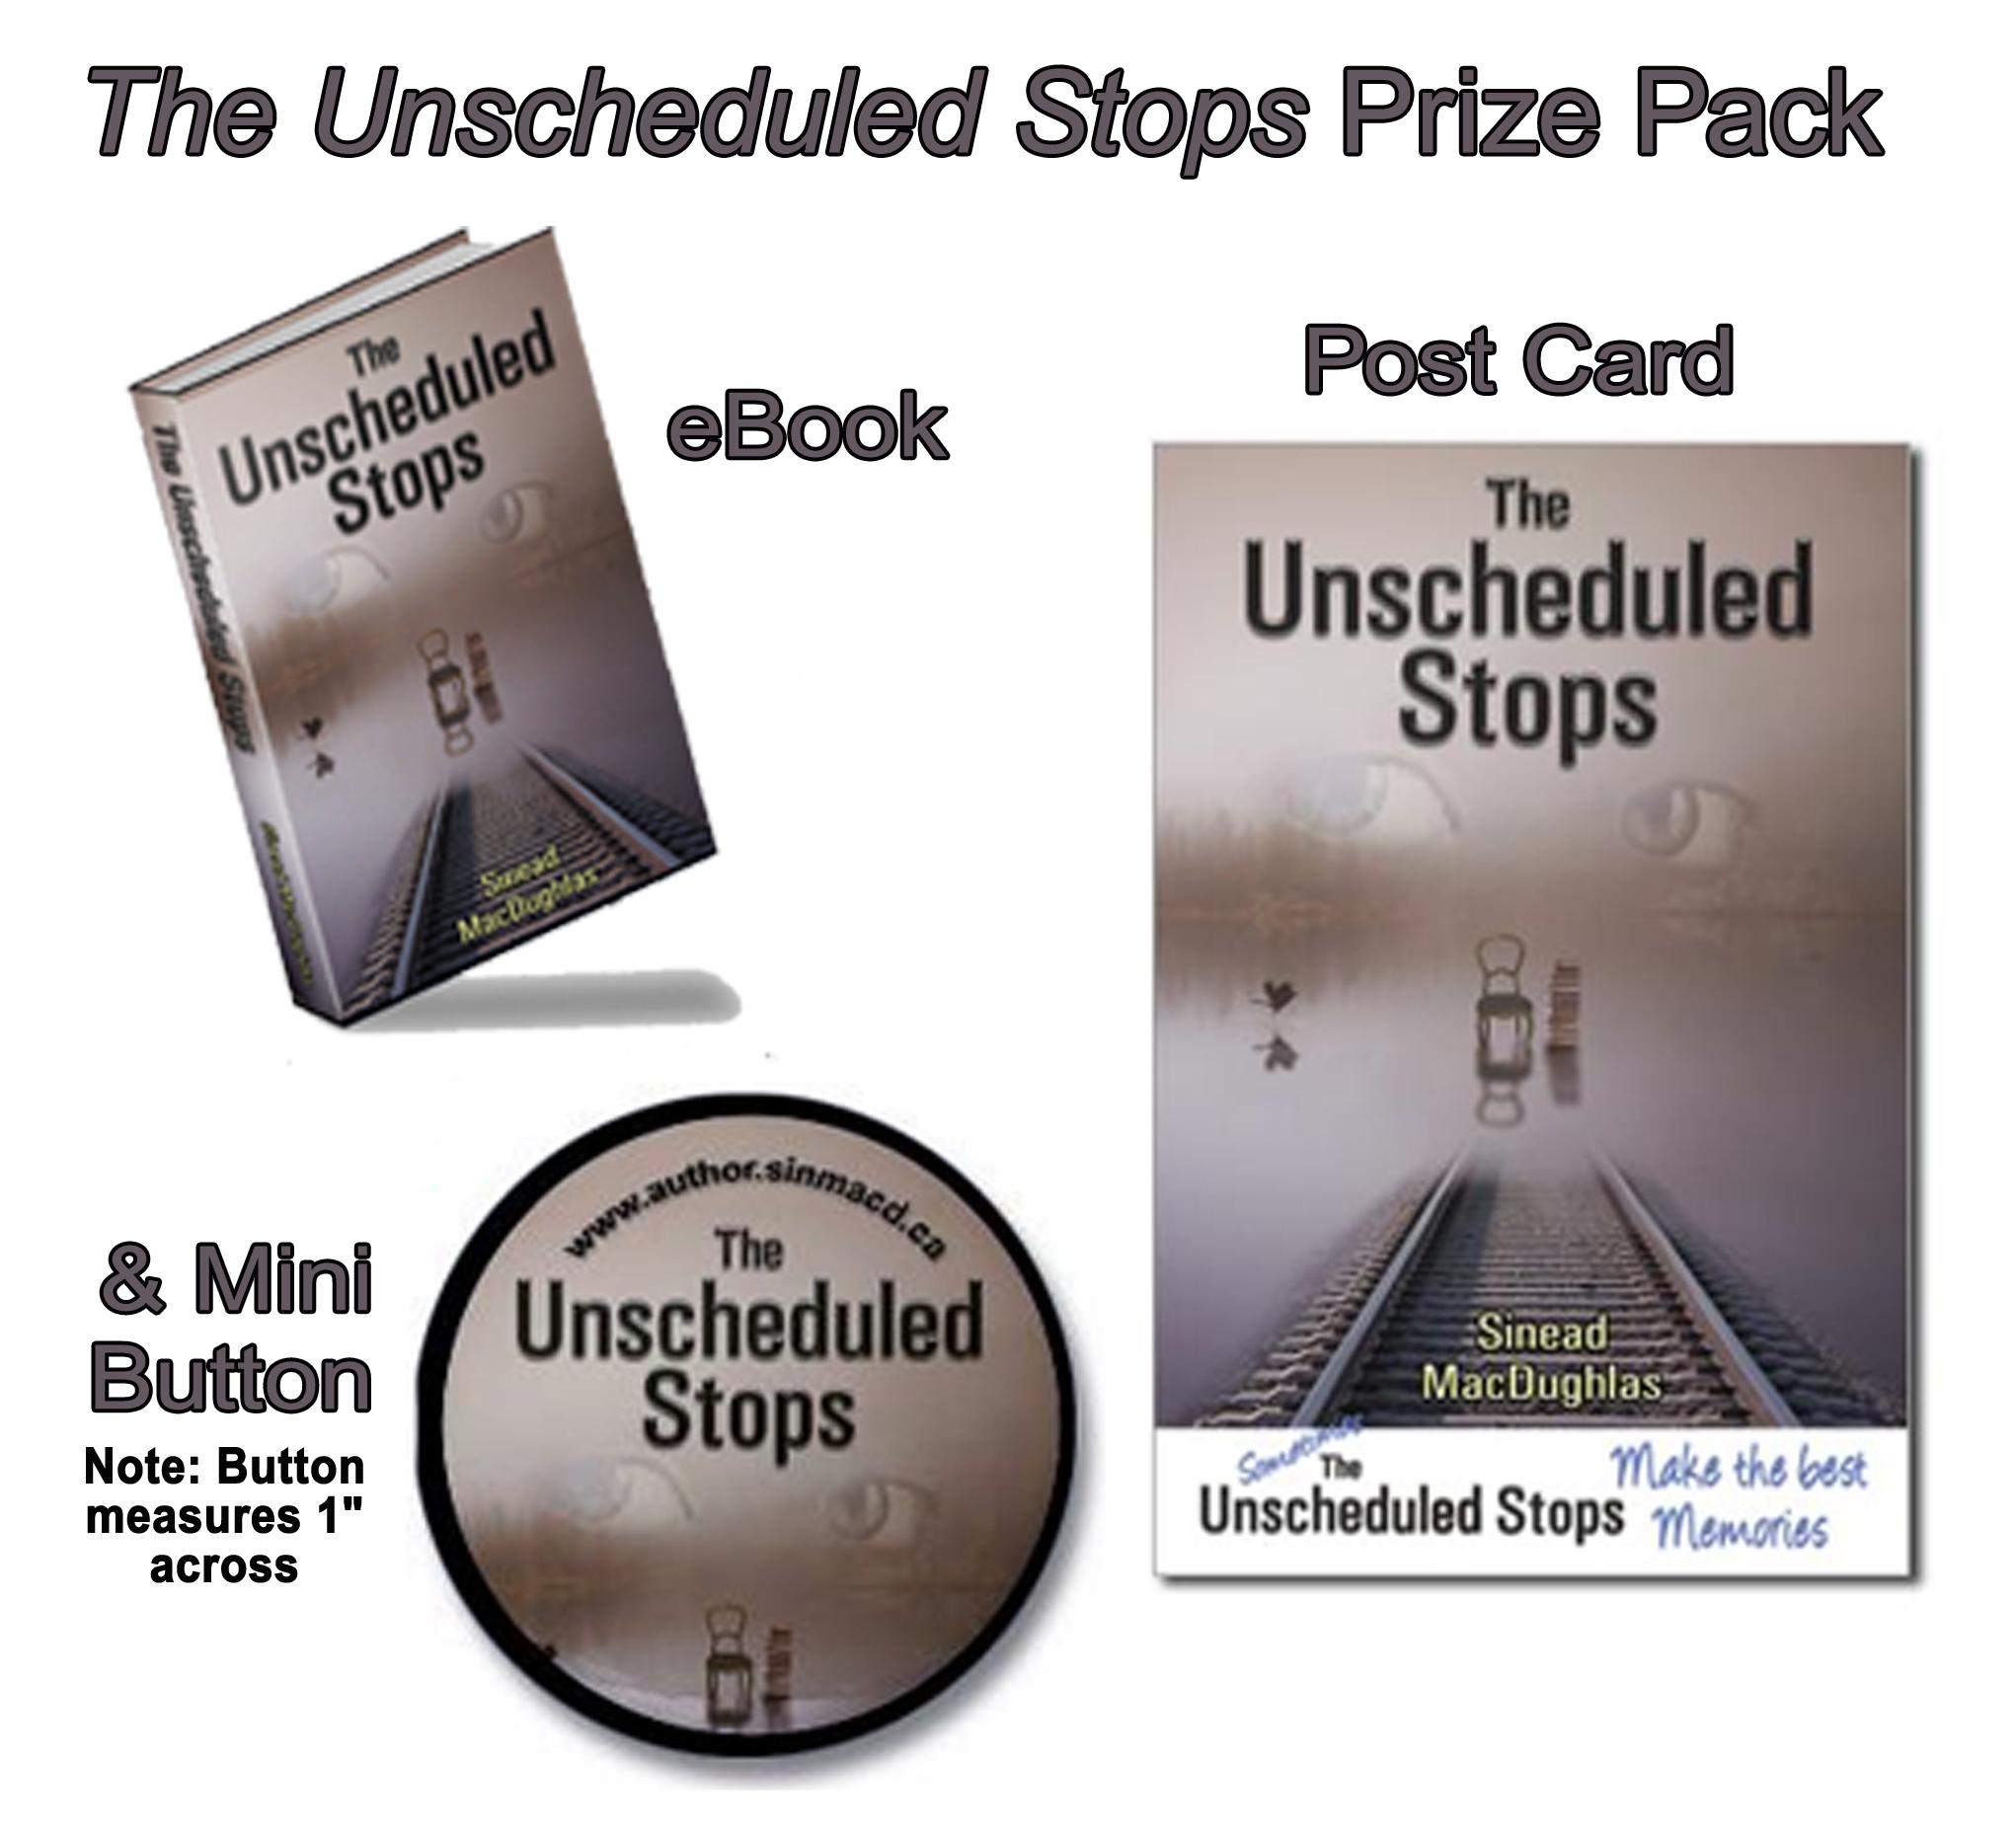 TUS Prize Pack